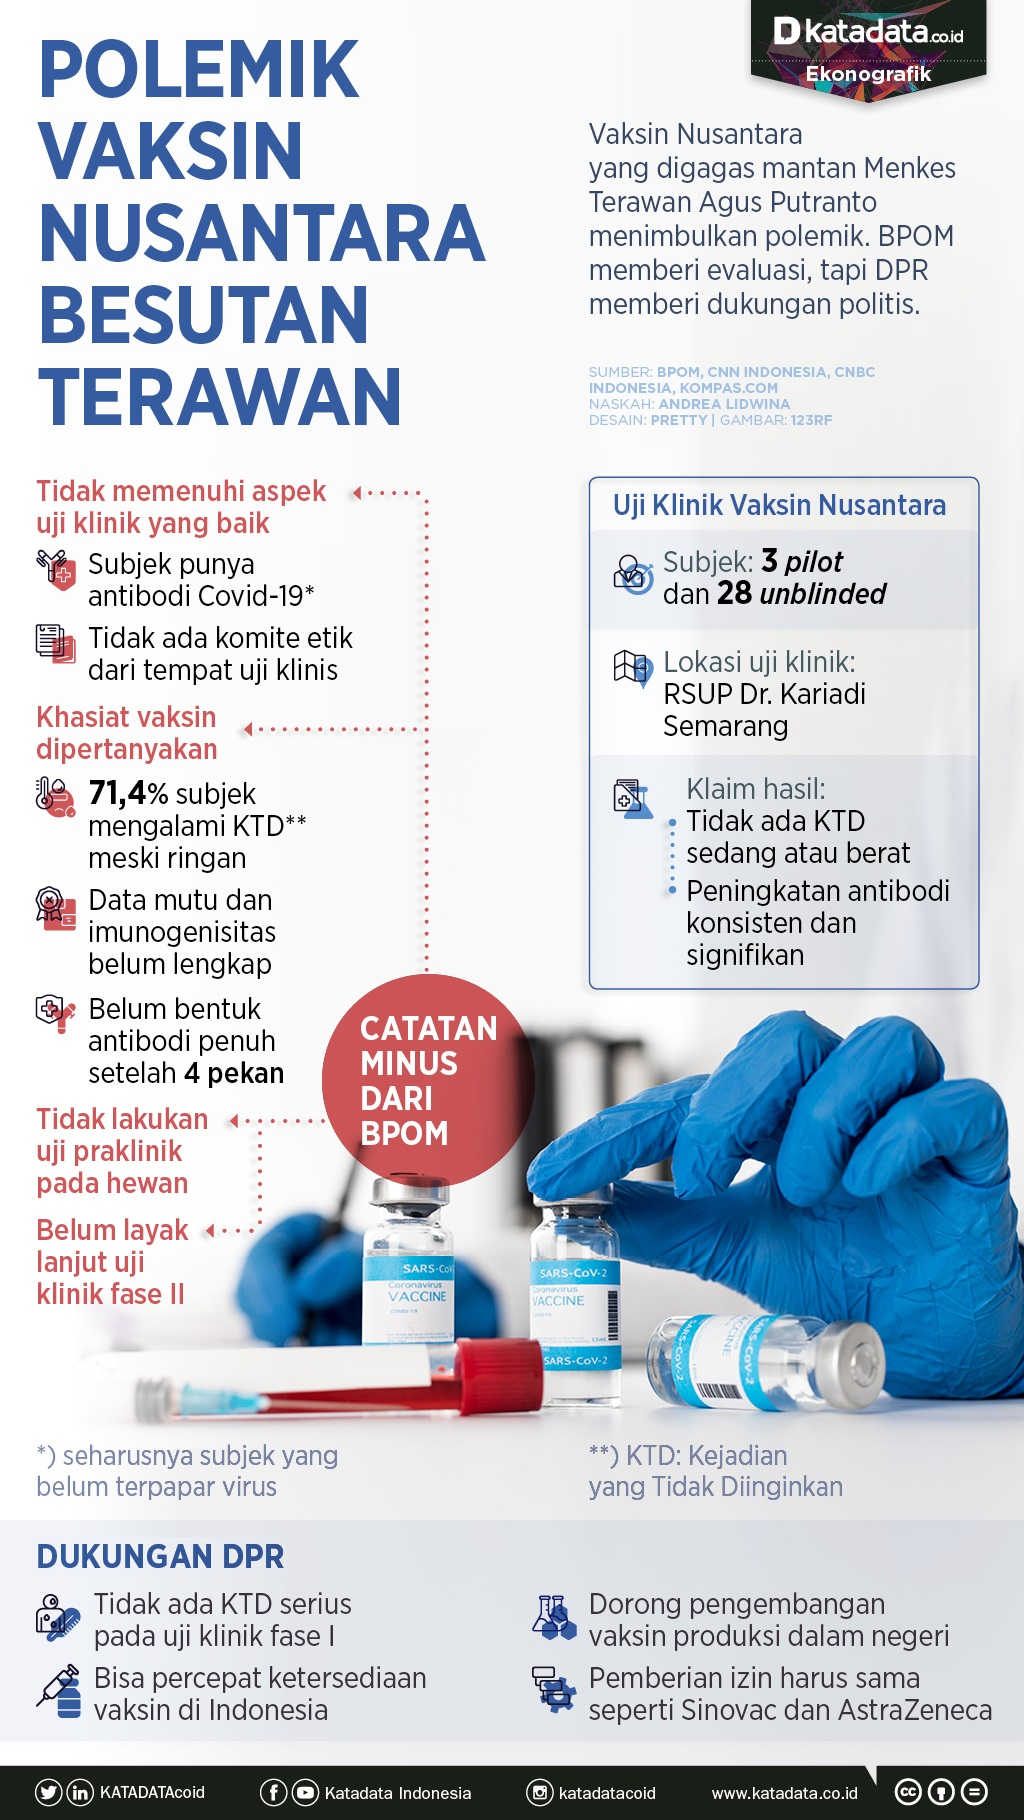 Infografik_Polemik vaksin nusantara besutan terawan